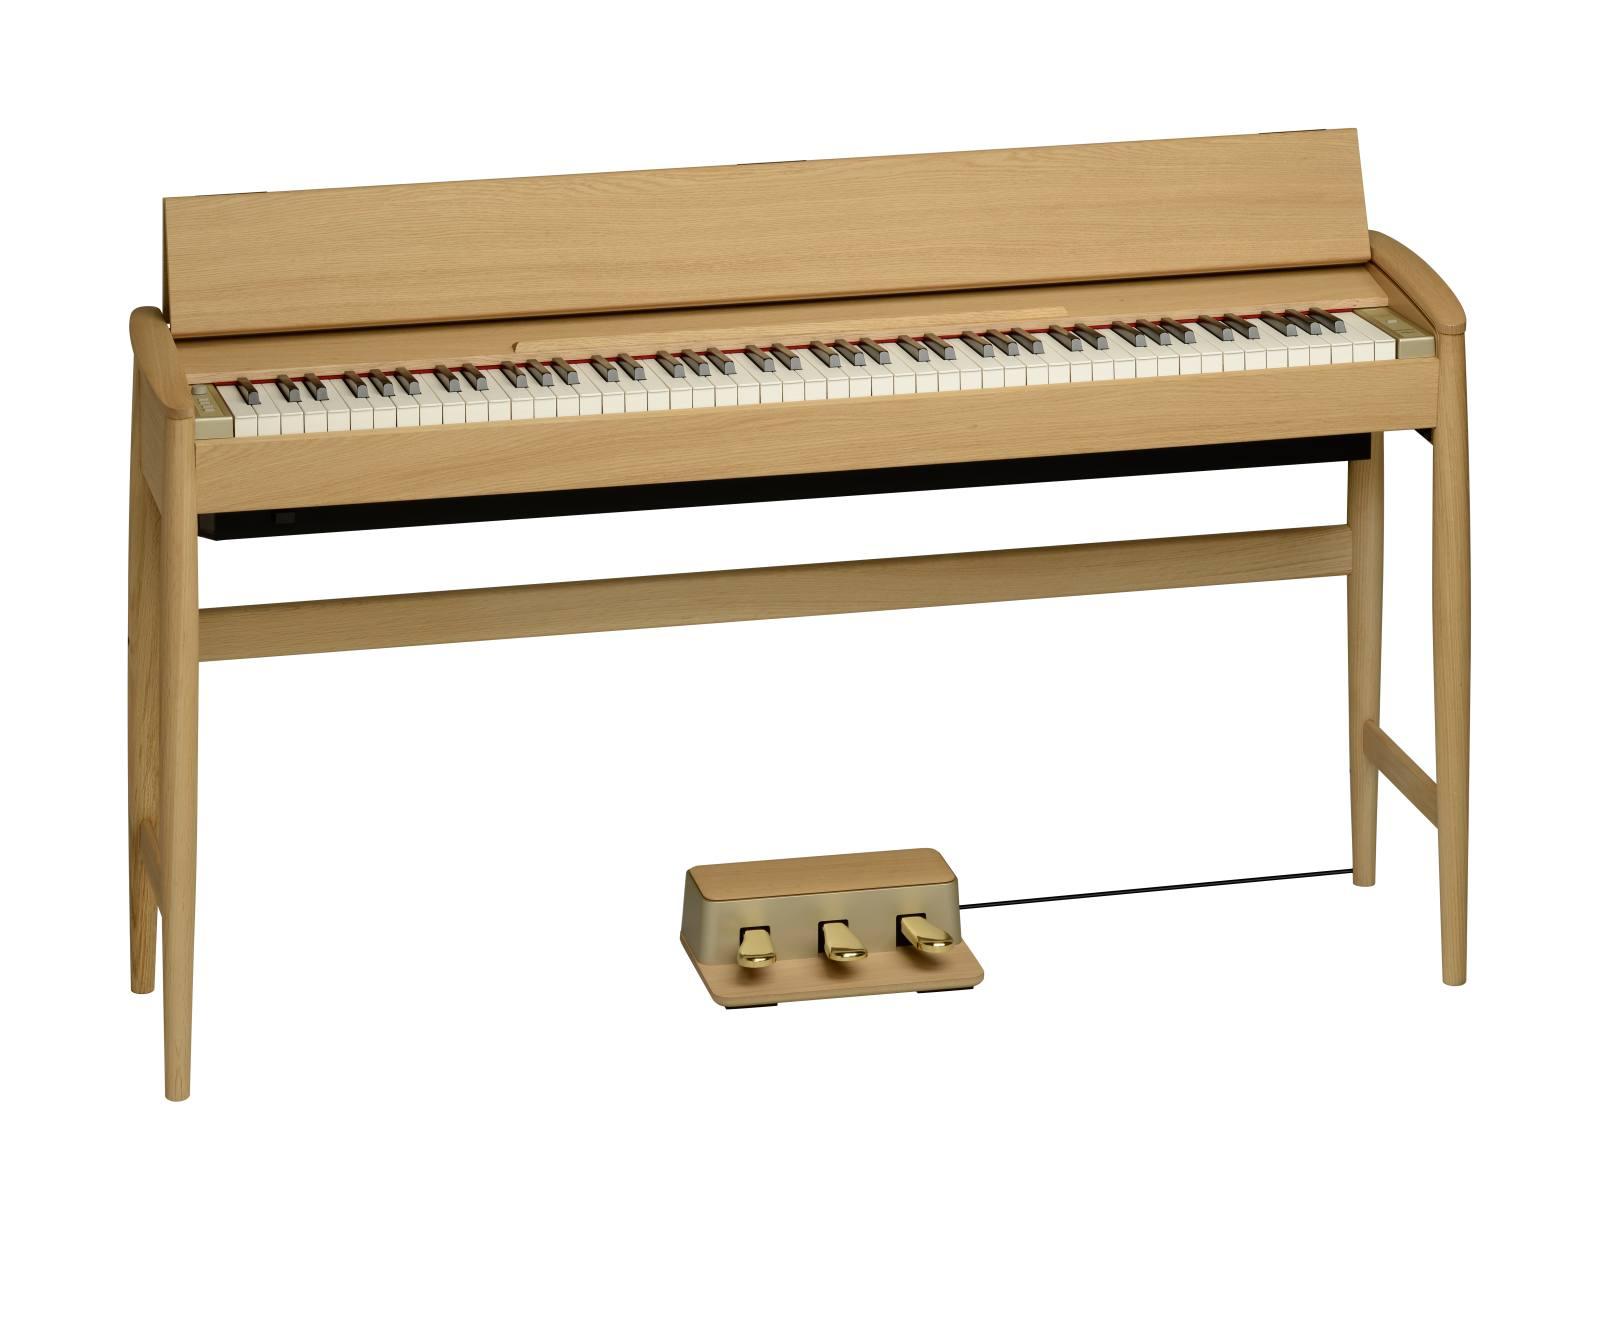 roland kf 10 ko piano buy online free. Black Bedroom Furniture Sets. Home Design Ideas